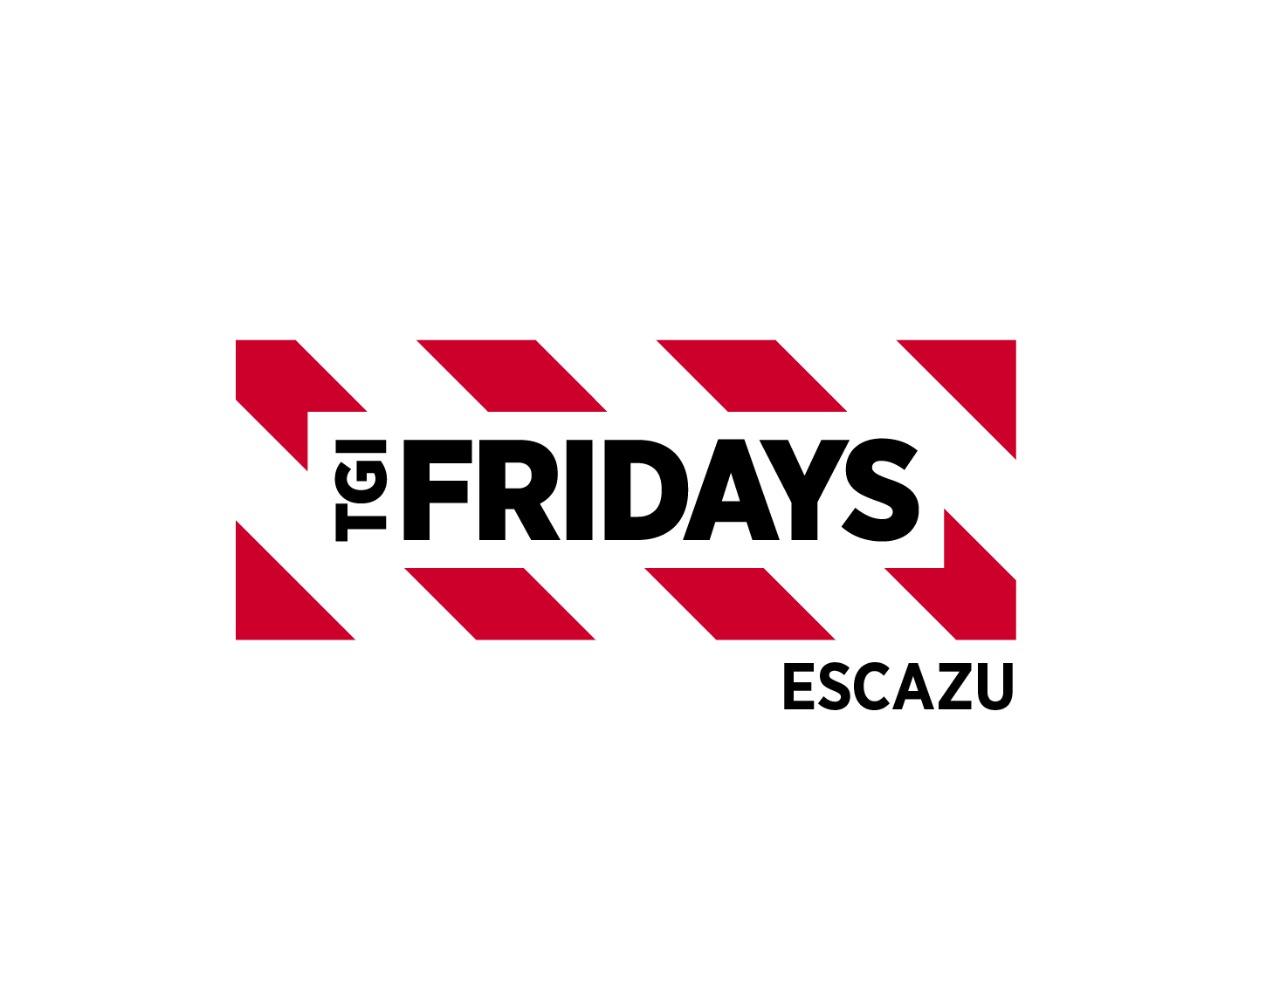 TGI Friday's (Escazu) logo